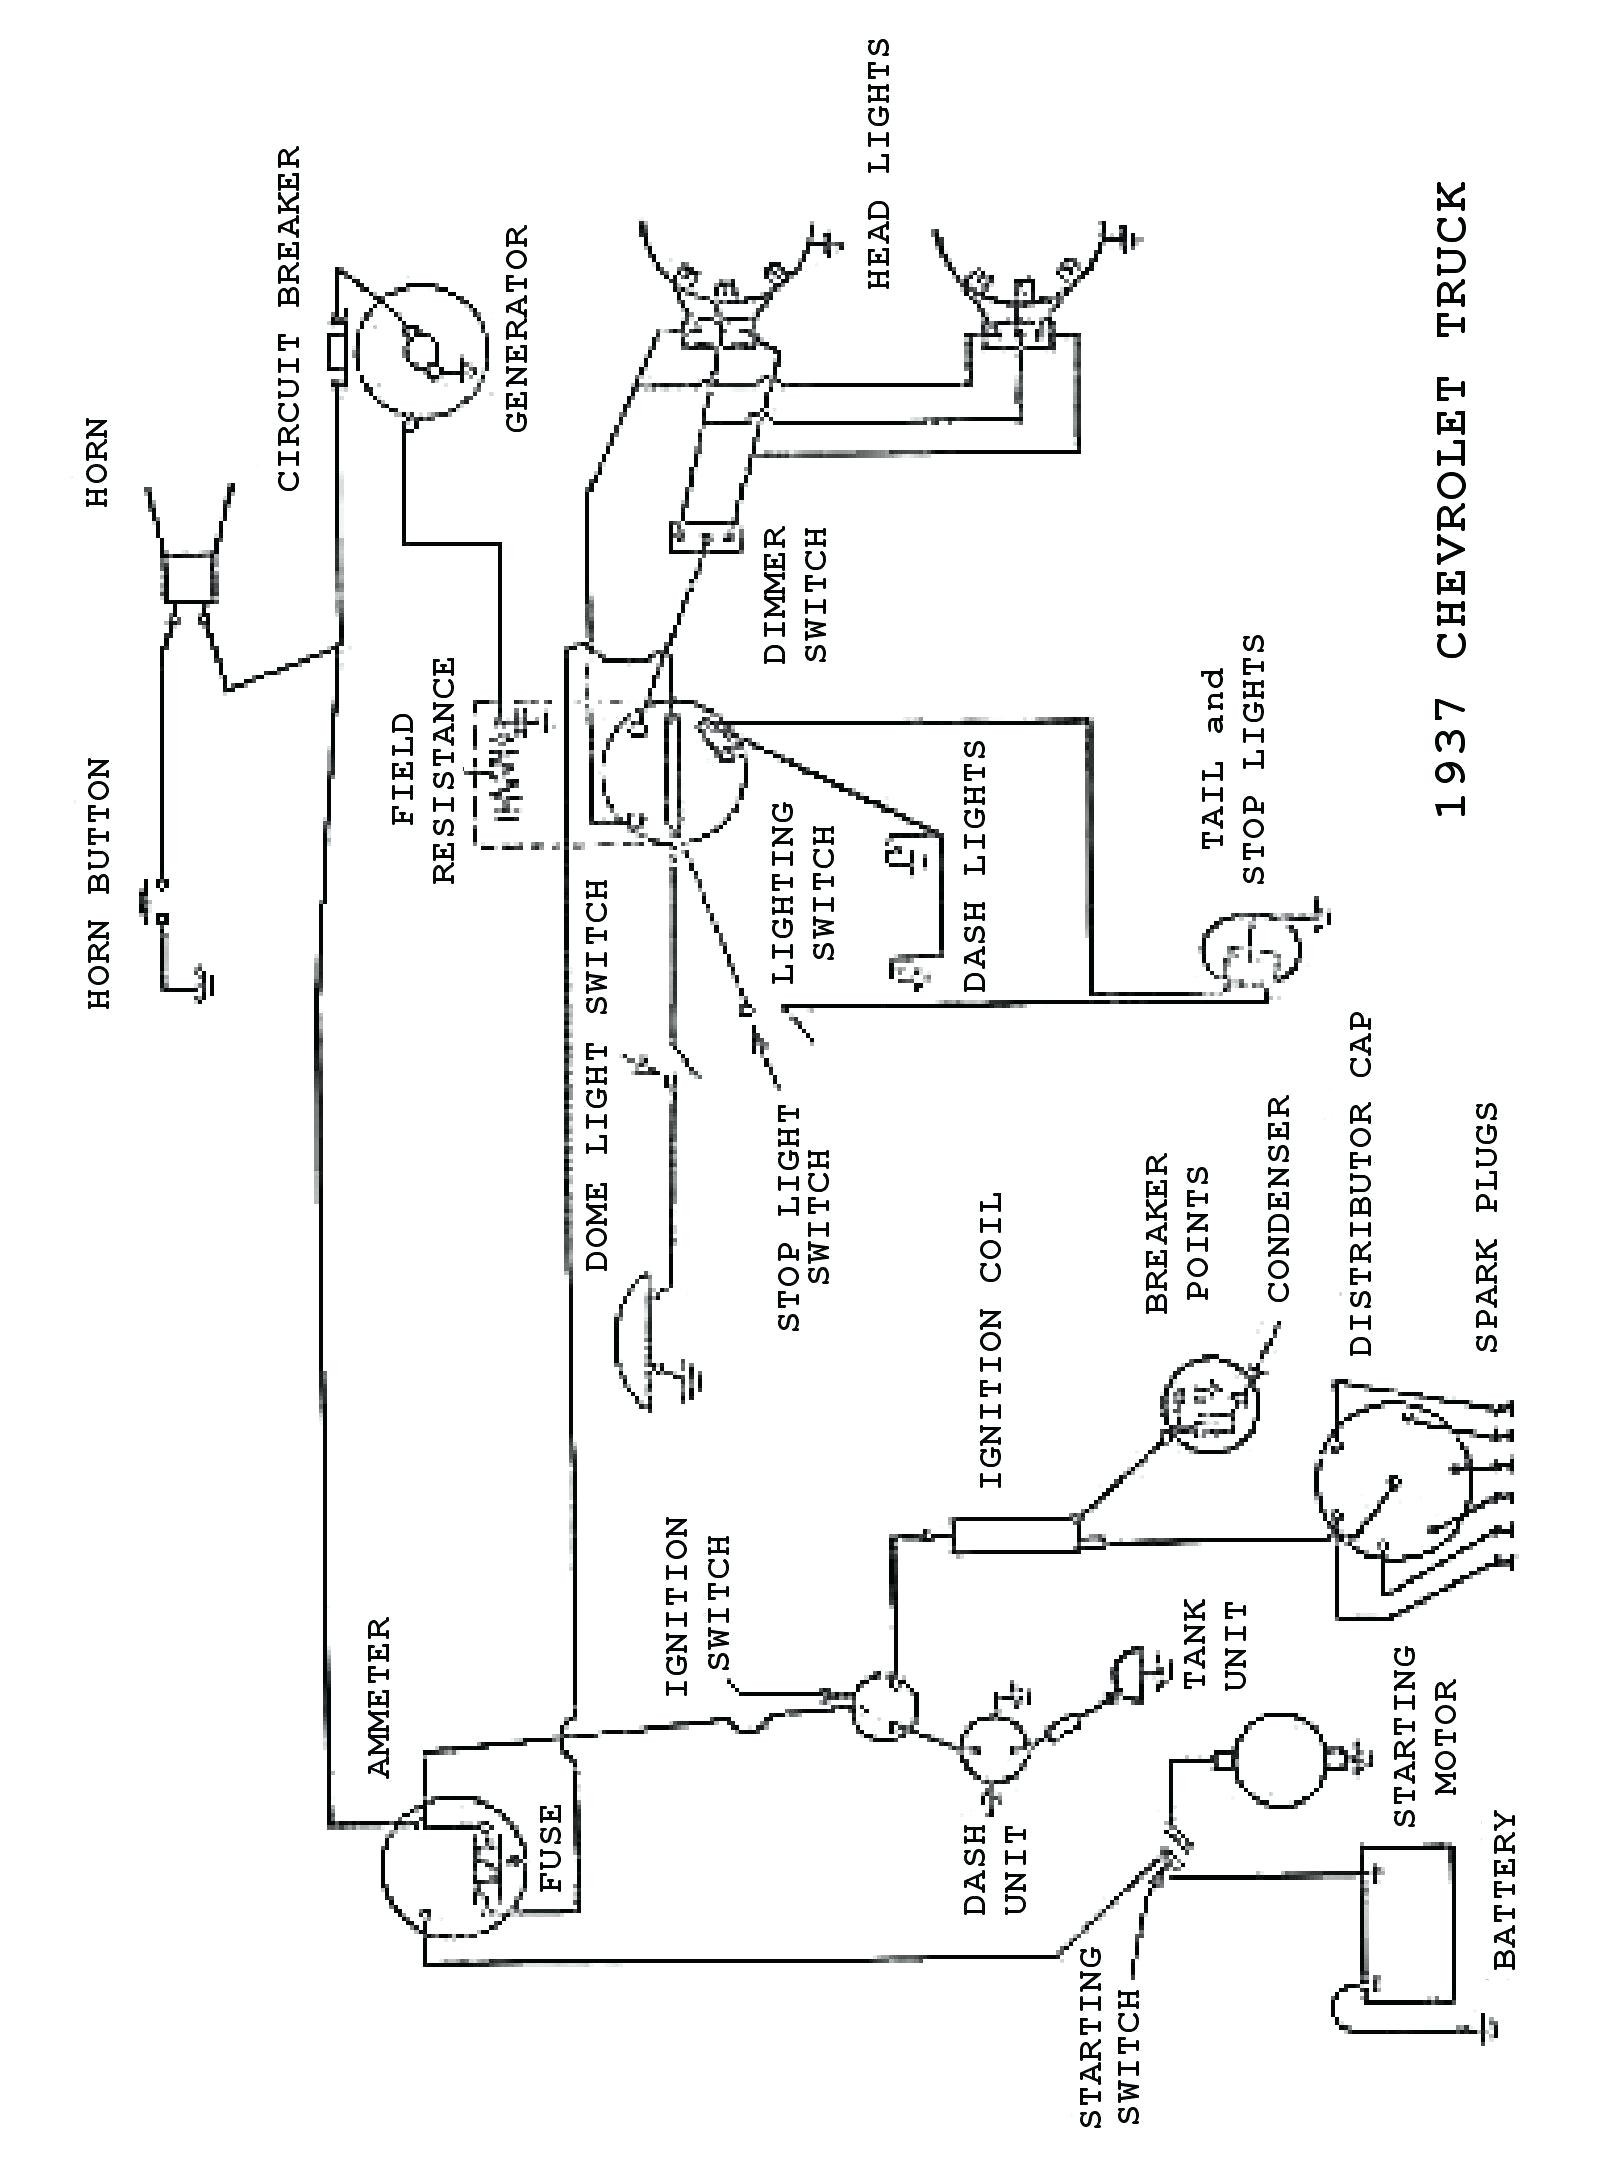 John Deere 12 Volt Wiring Diagram Elegant